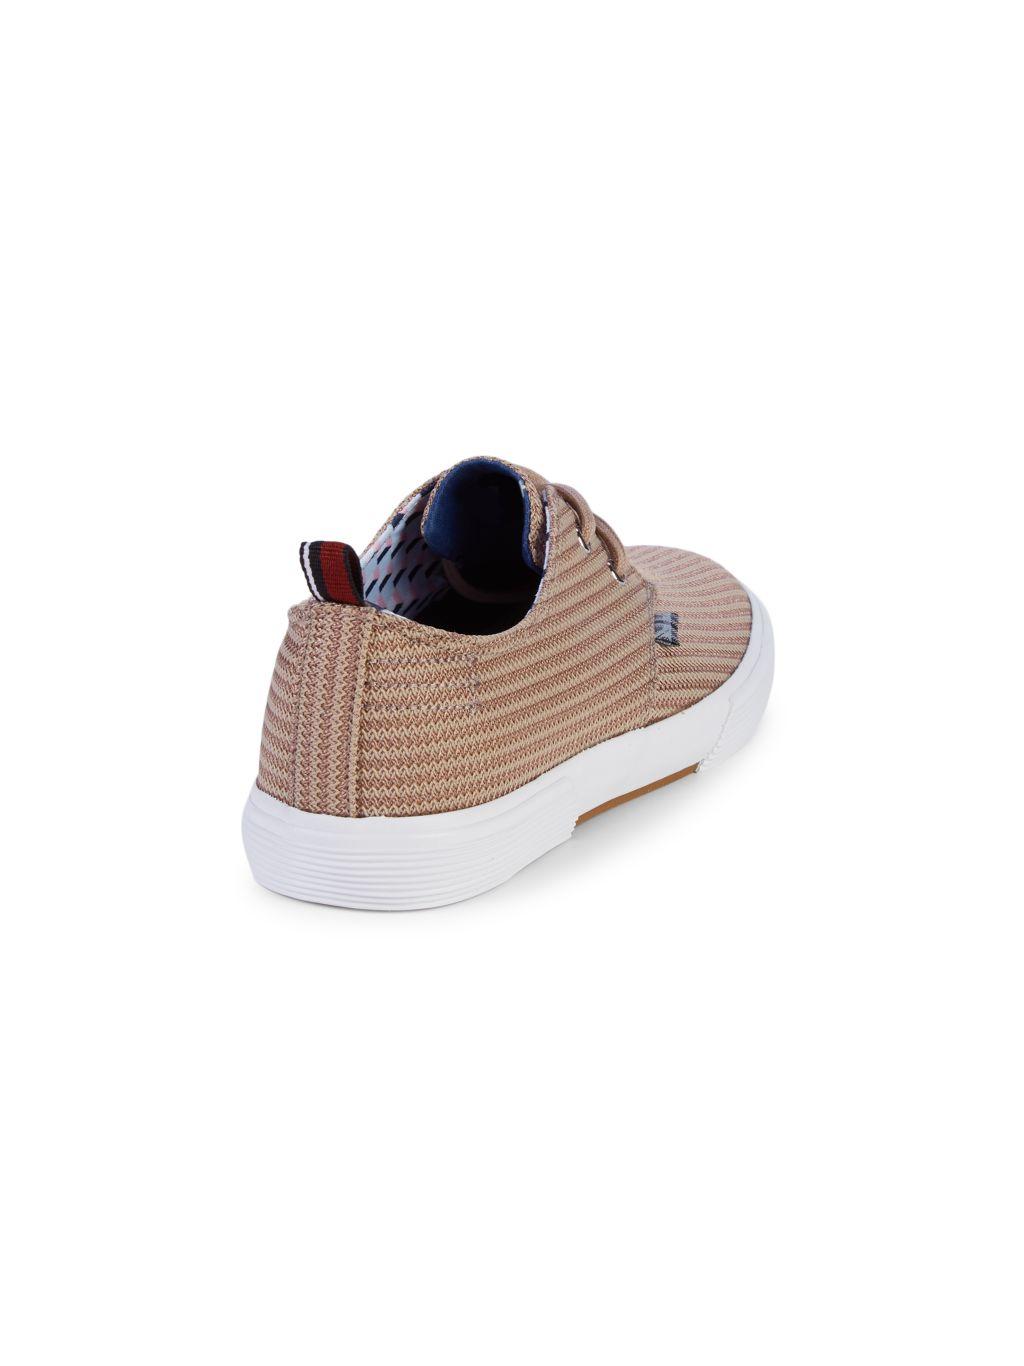 Ben Sherman Bristol Textured Platform Sneakers